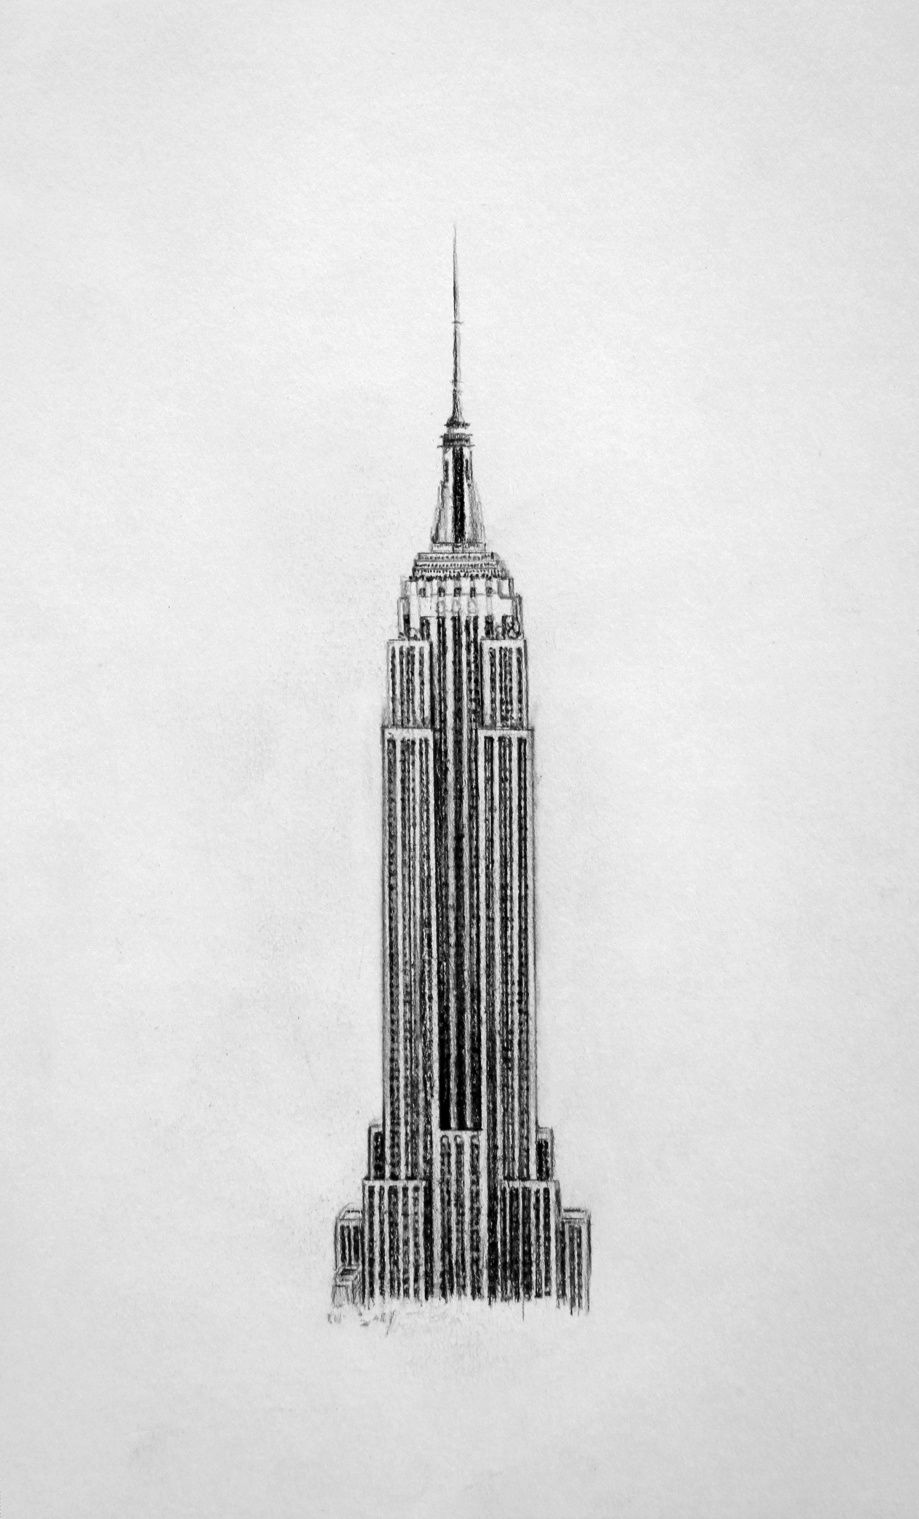 Empire State Building Empire State Building Drawing Building